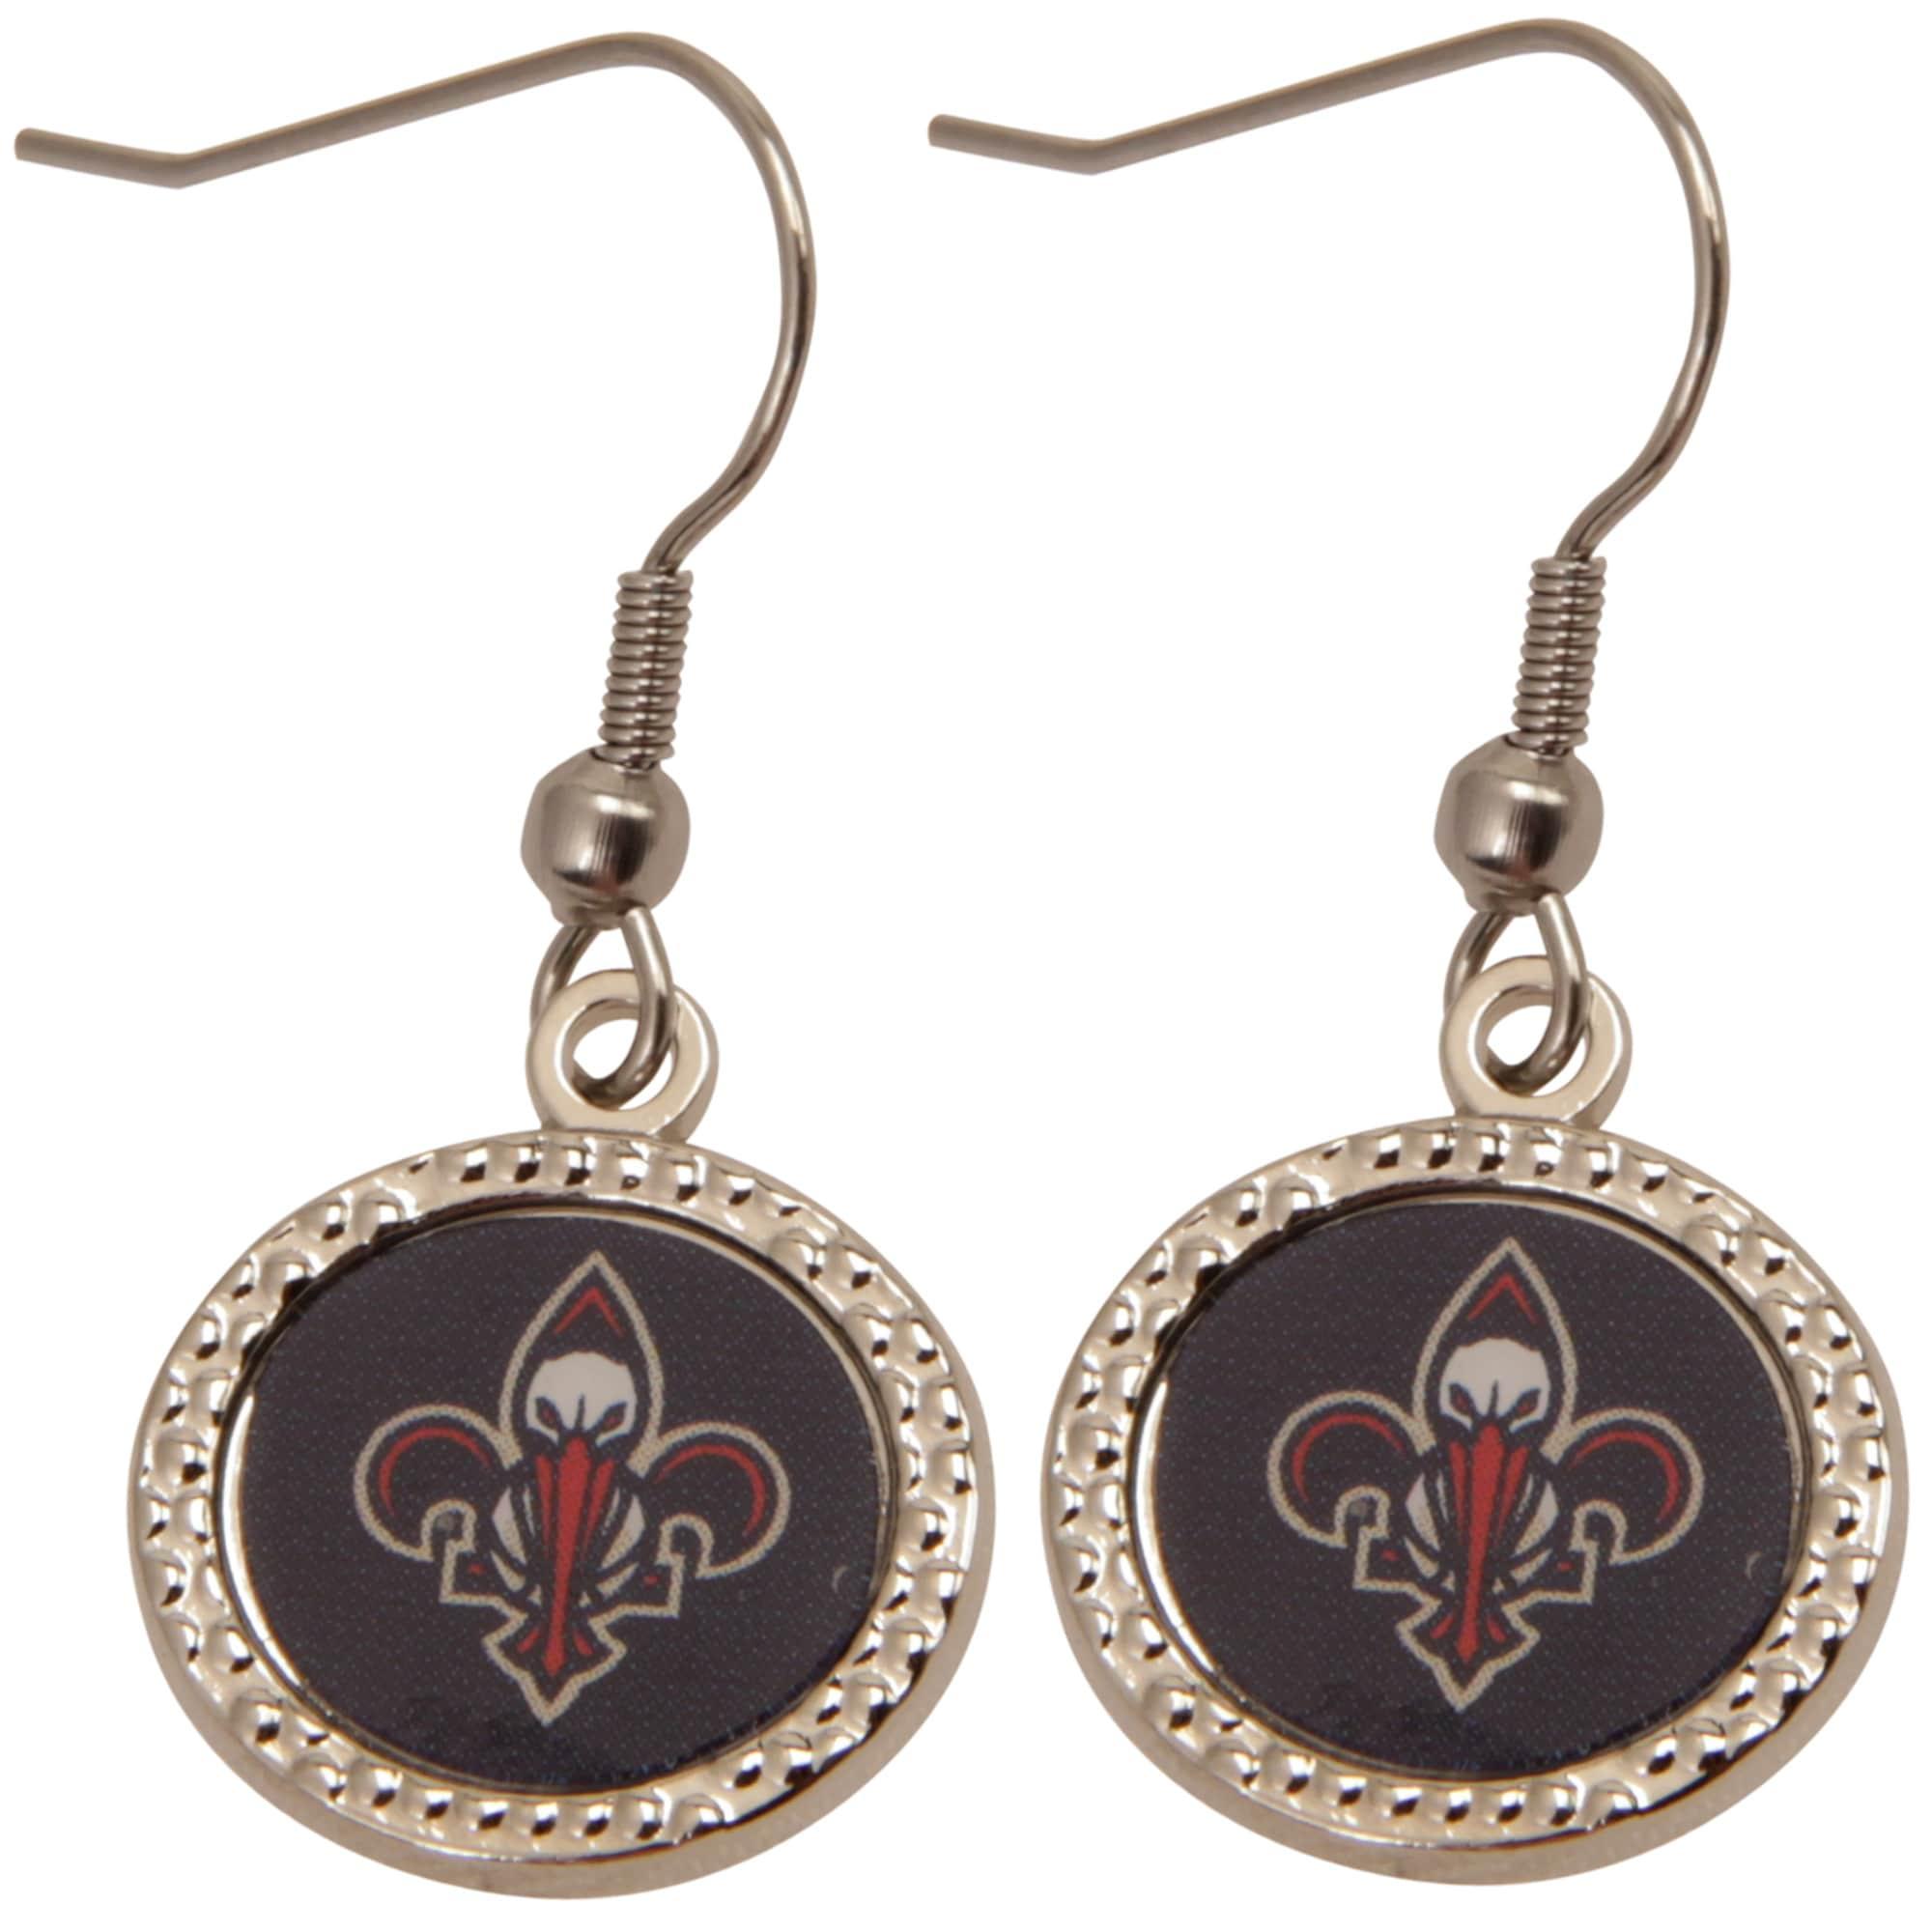 New Orleans Pelicans WinCraft Women's Round Dangle Earrings